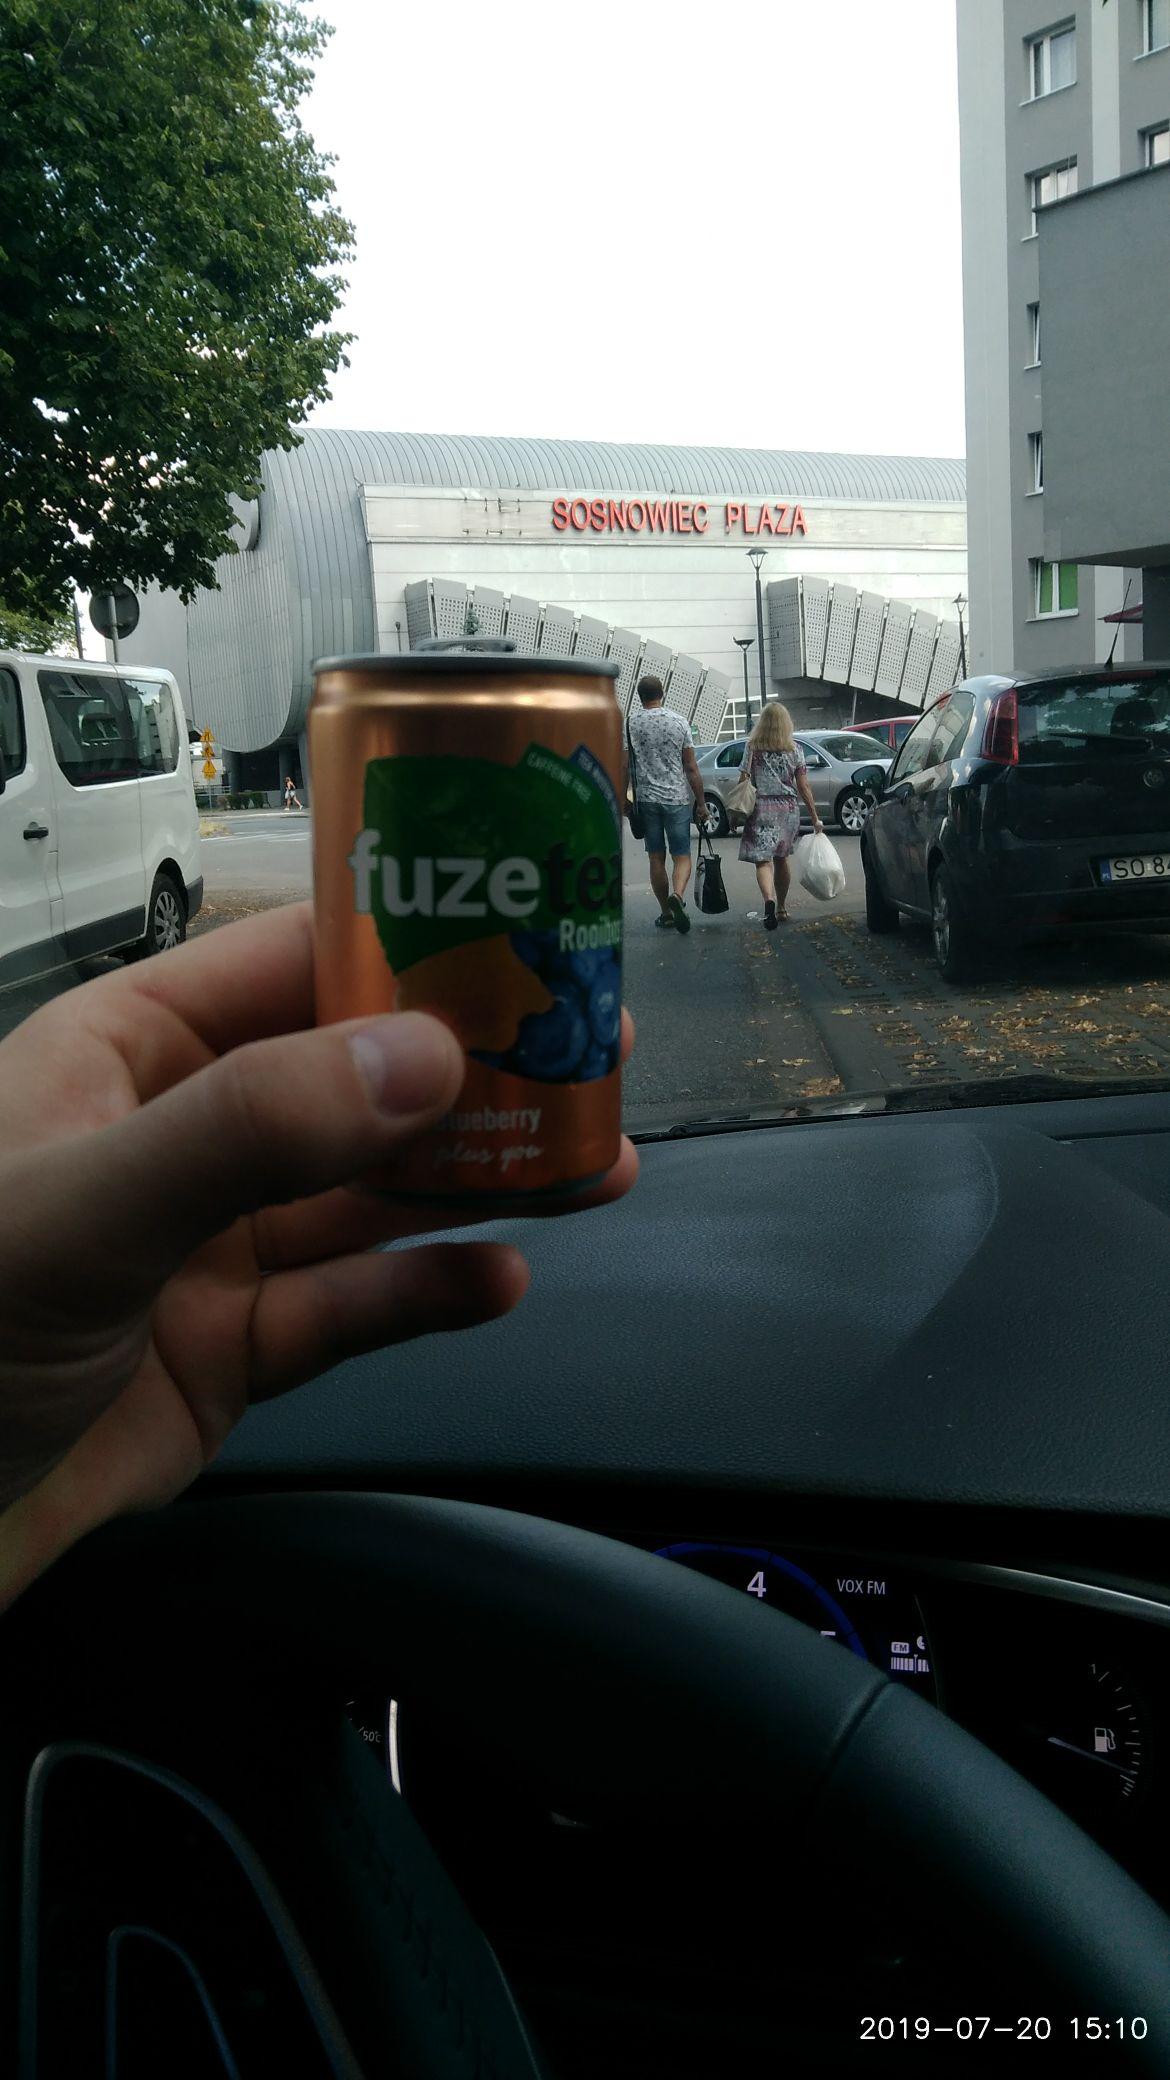 Fuze Tea za darmo Sosnowiec Plaza